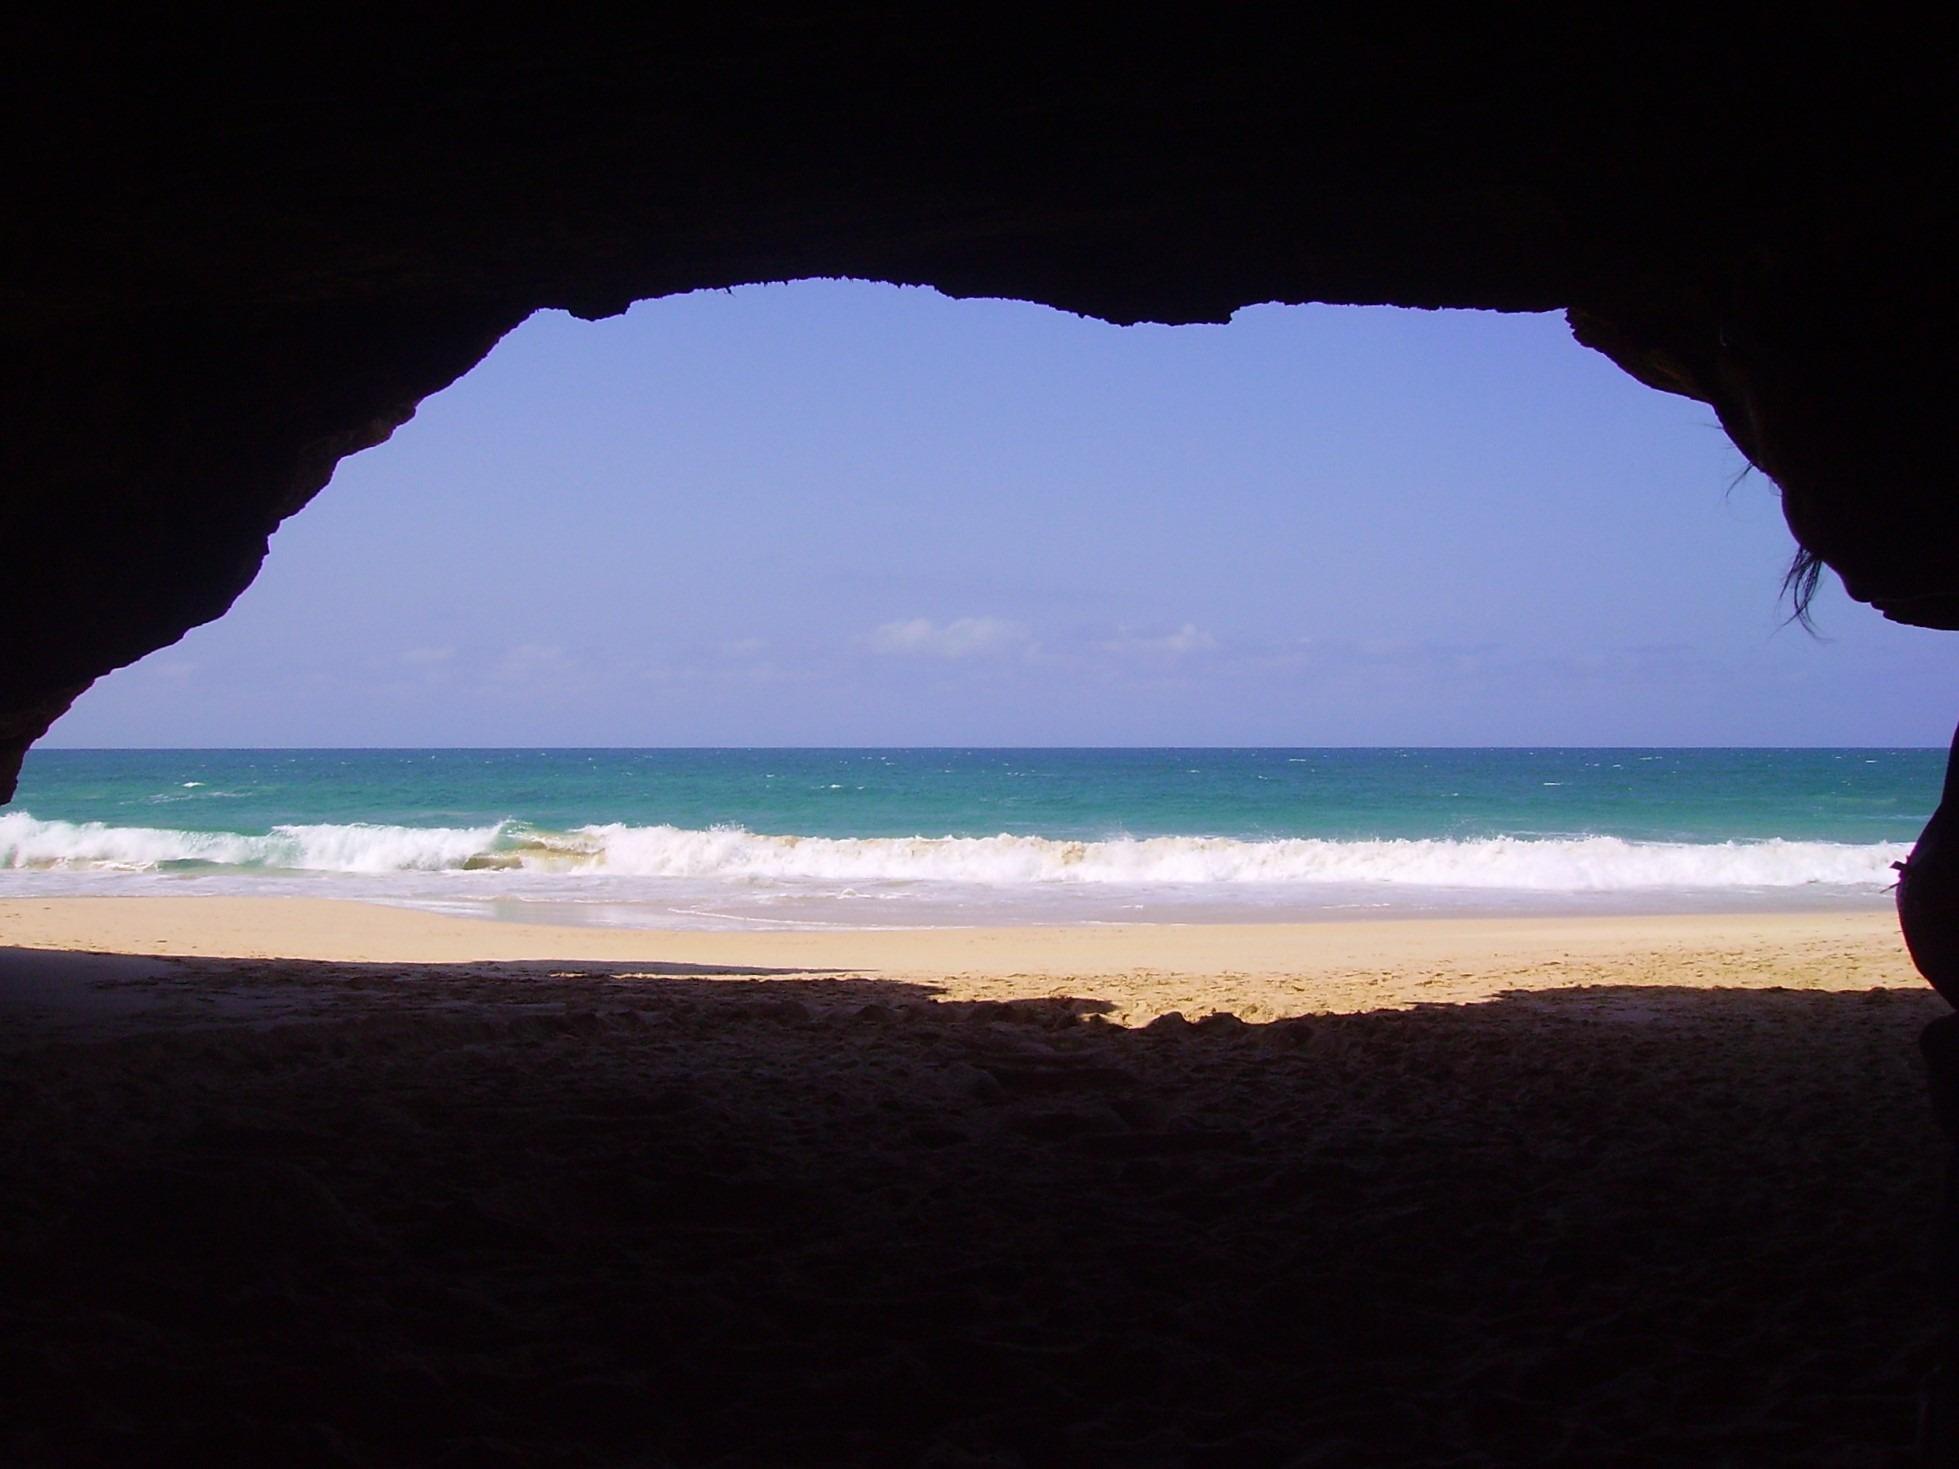 [cml_media_alt id='5164']Boa Vista - Capo Verde - Credits Nico[/cml_media_alt]